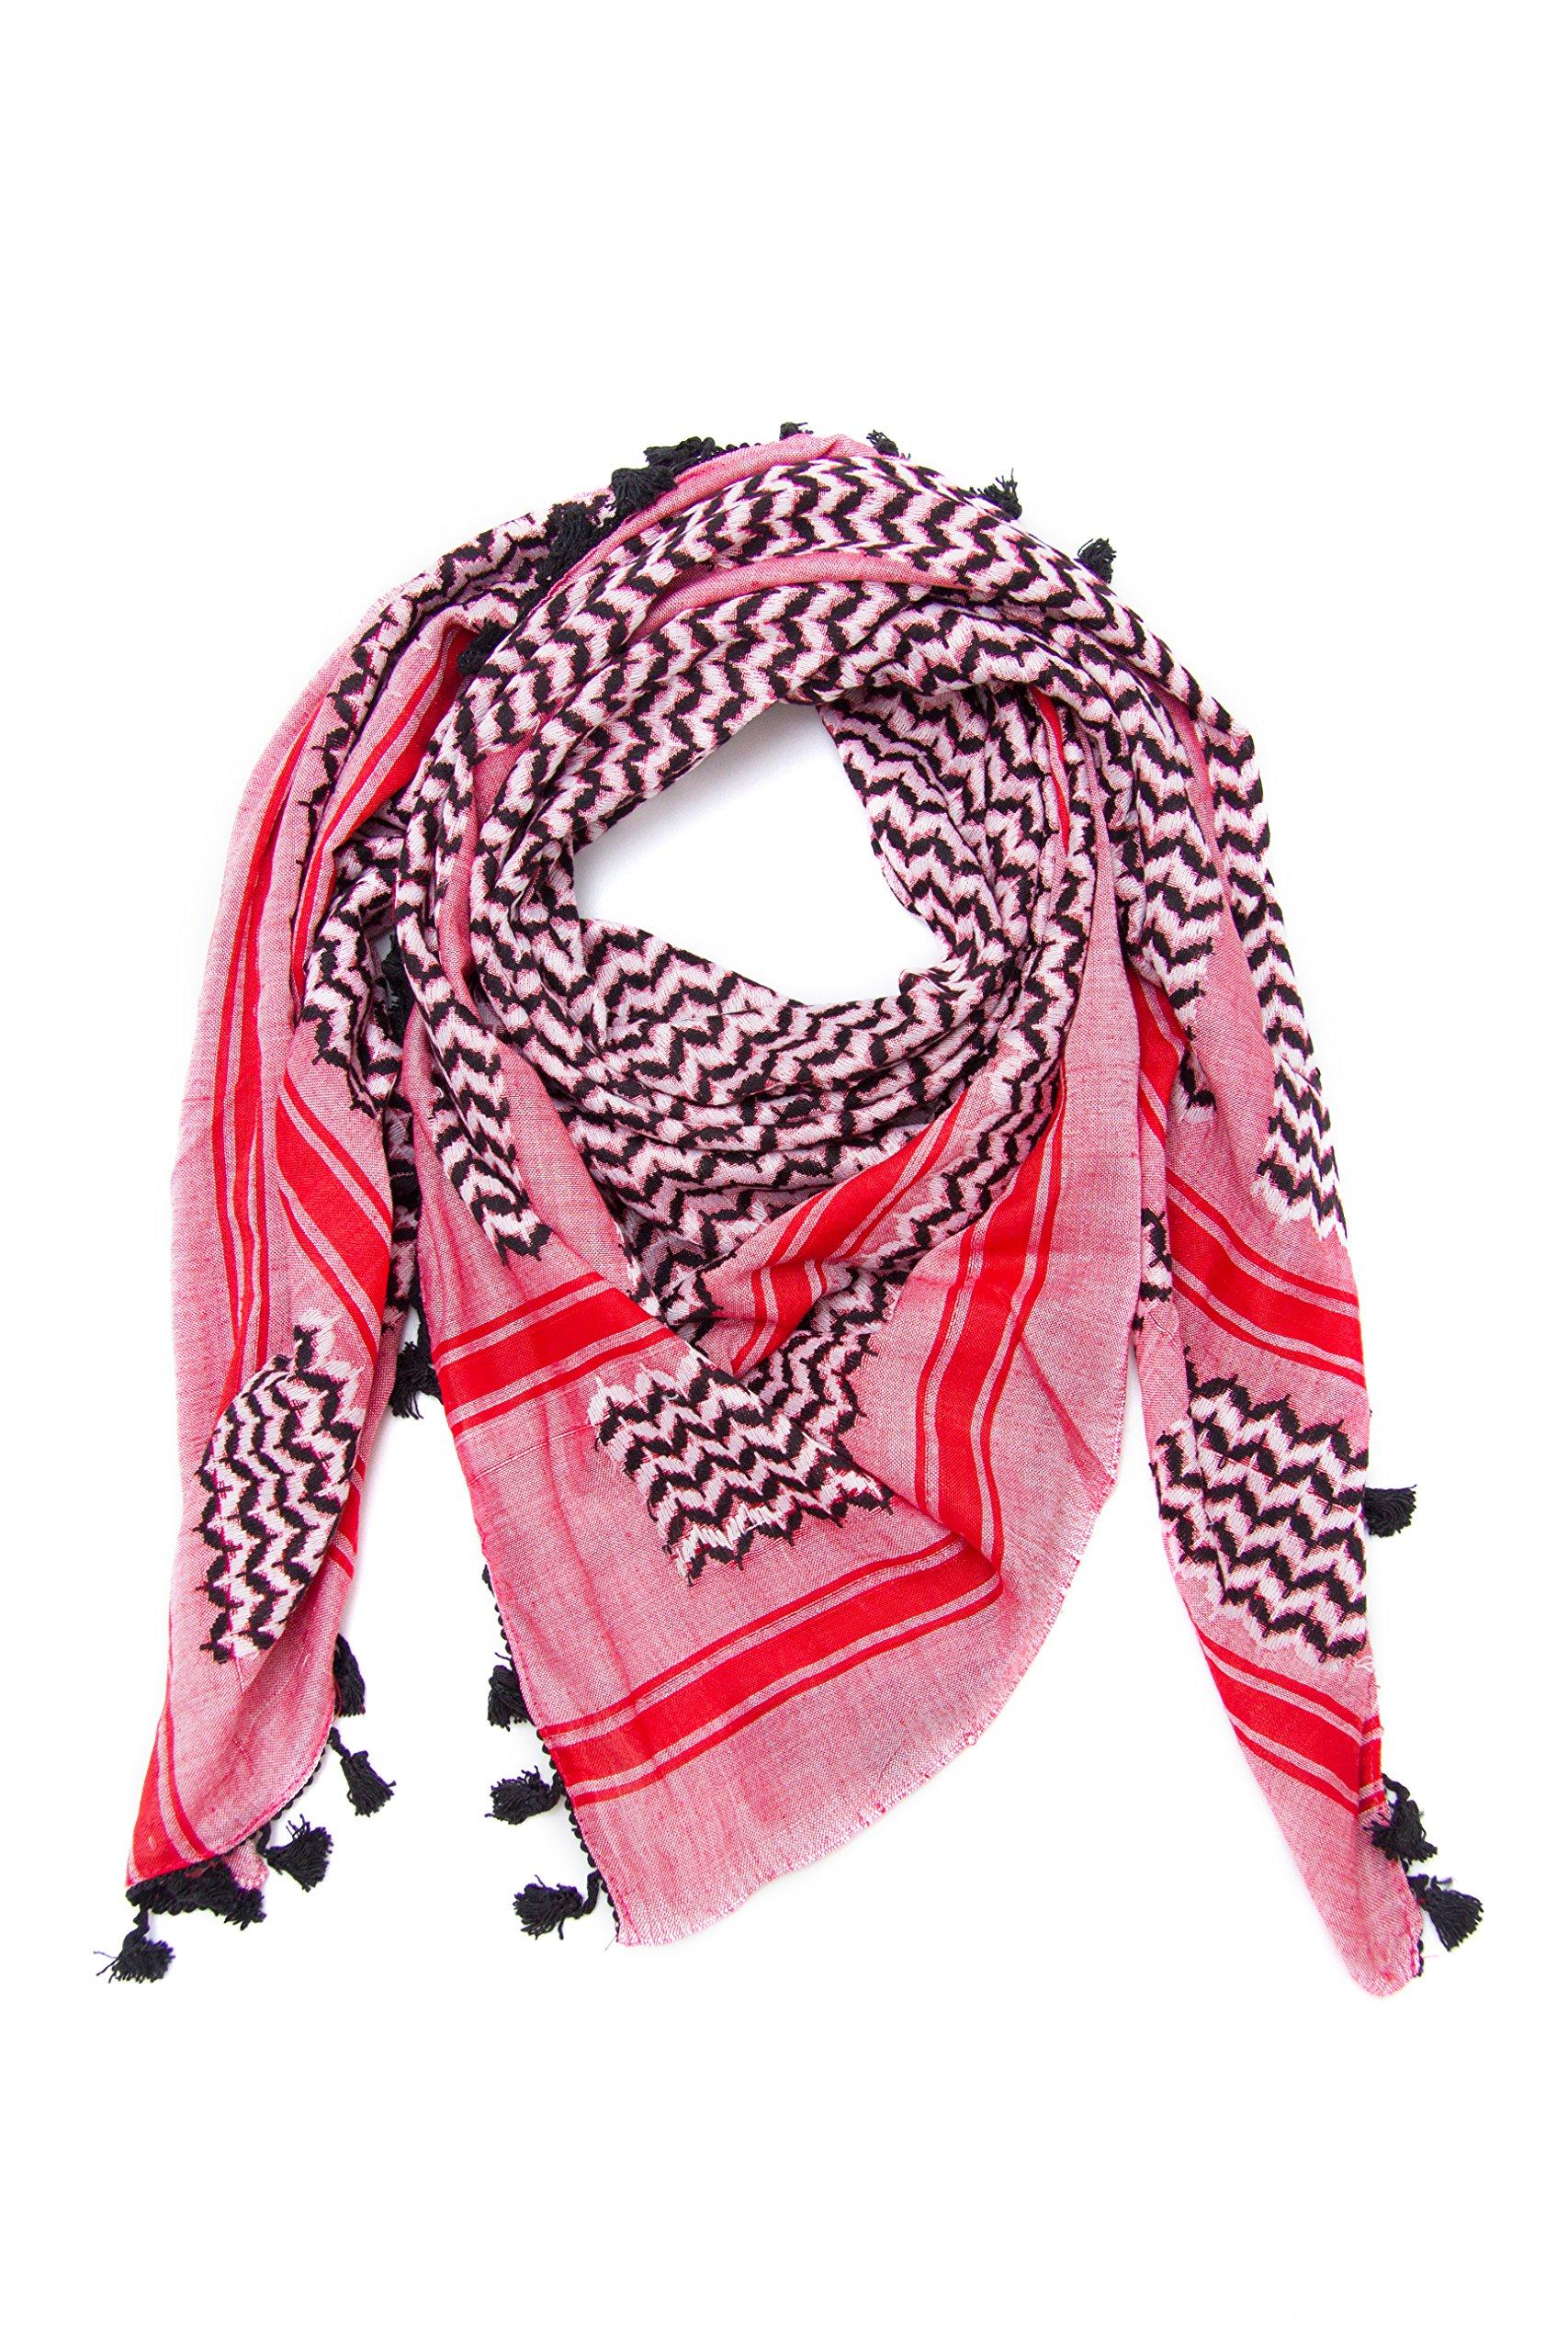 Hirbawi Premium Arabic Scarf 100% Cotton Shemagh Keffiyeh 47''x47'' Arab Scarf (Pink Zahra) Made in Palestine